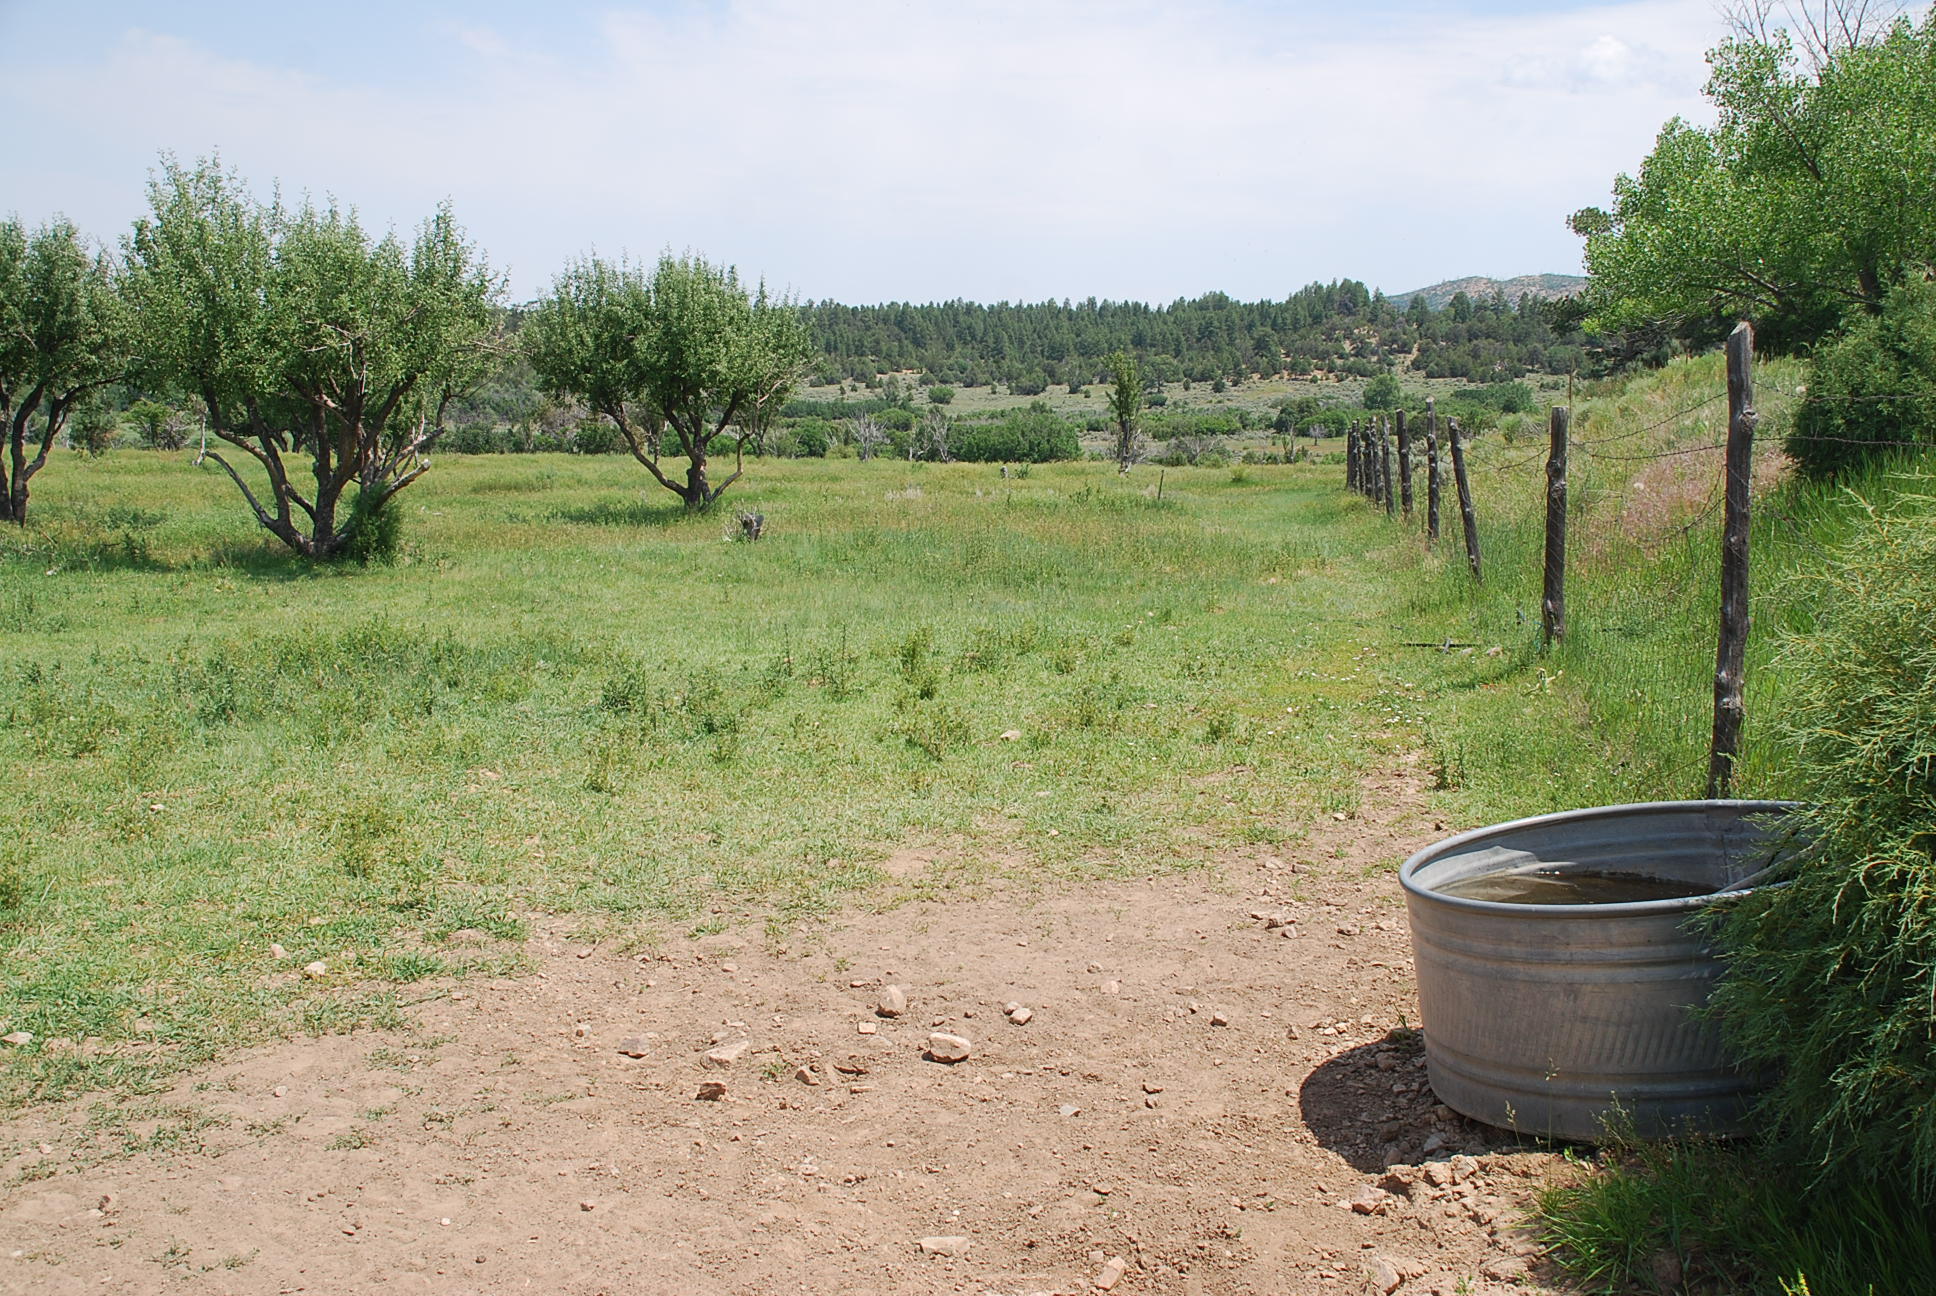 933 Bear Paw Rd., Bear Paw Ranch Property Photo 6